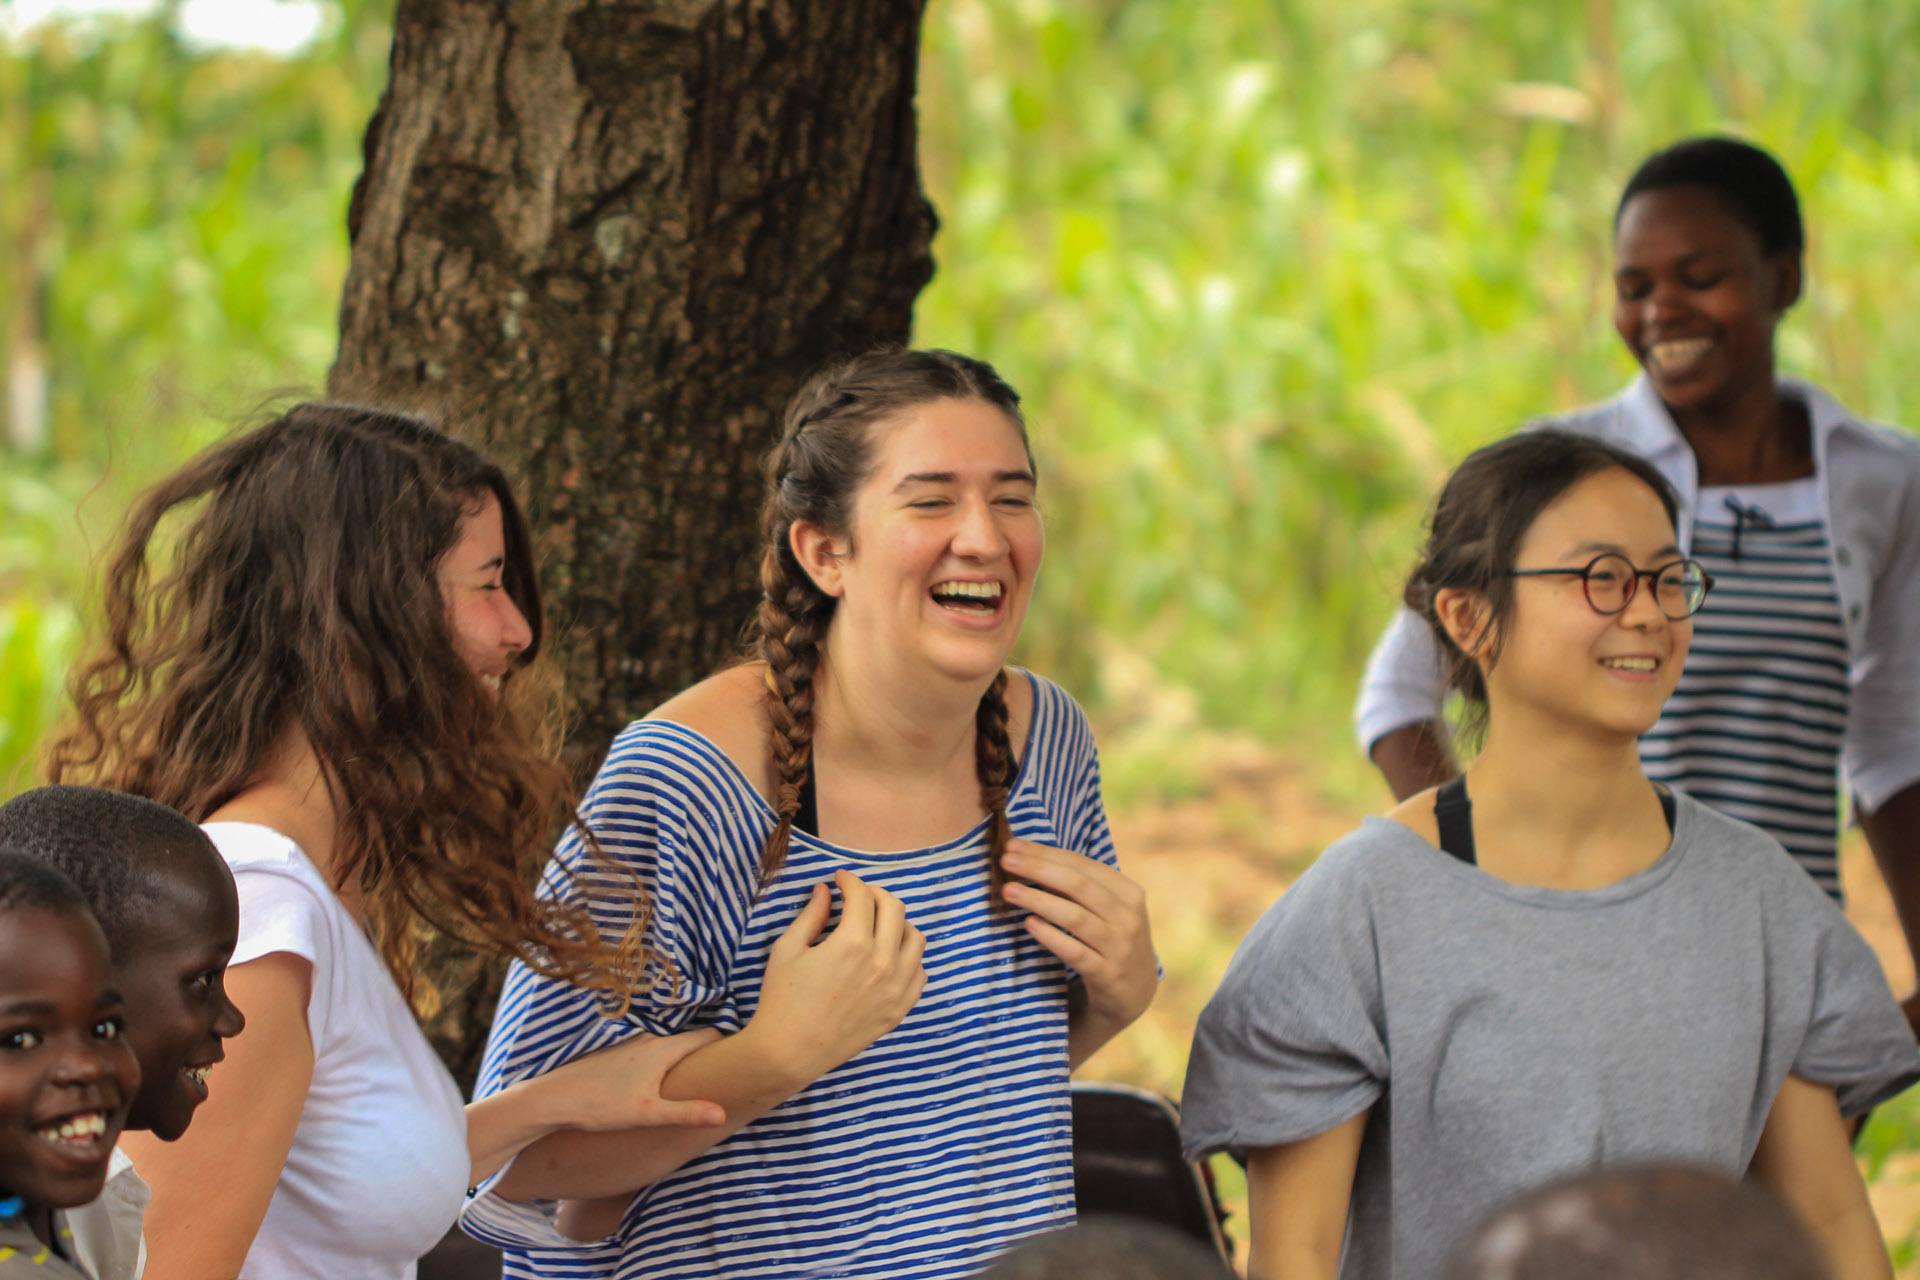 Volunteer in Kenya: Truly inspiring – by Freda from China